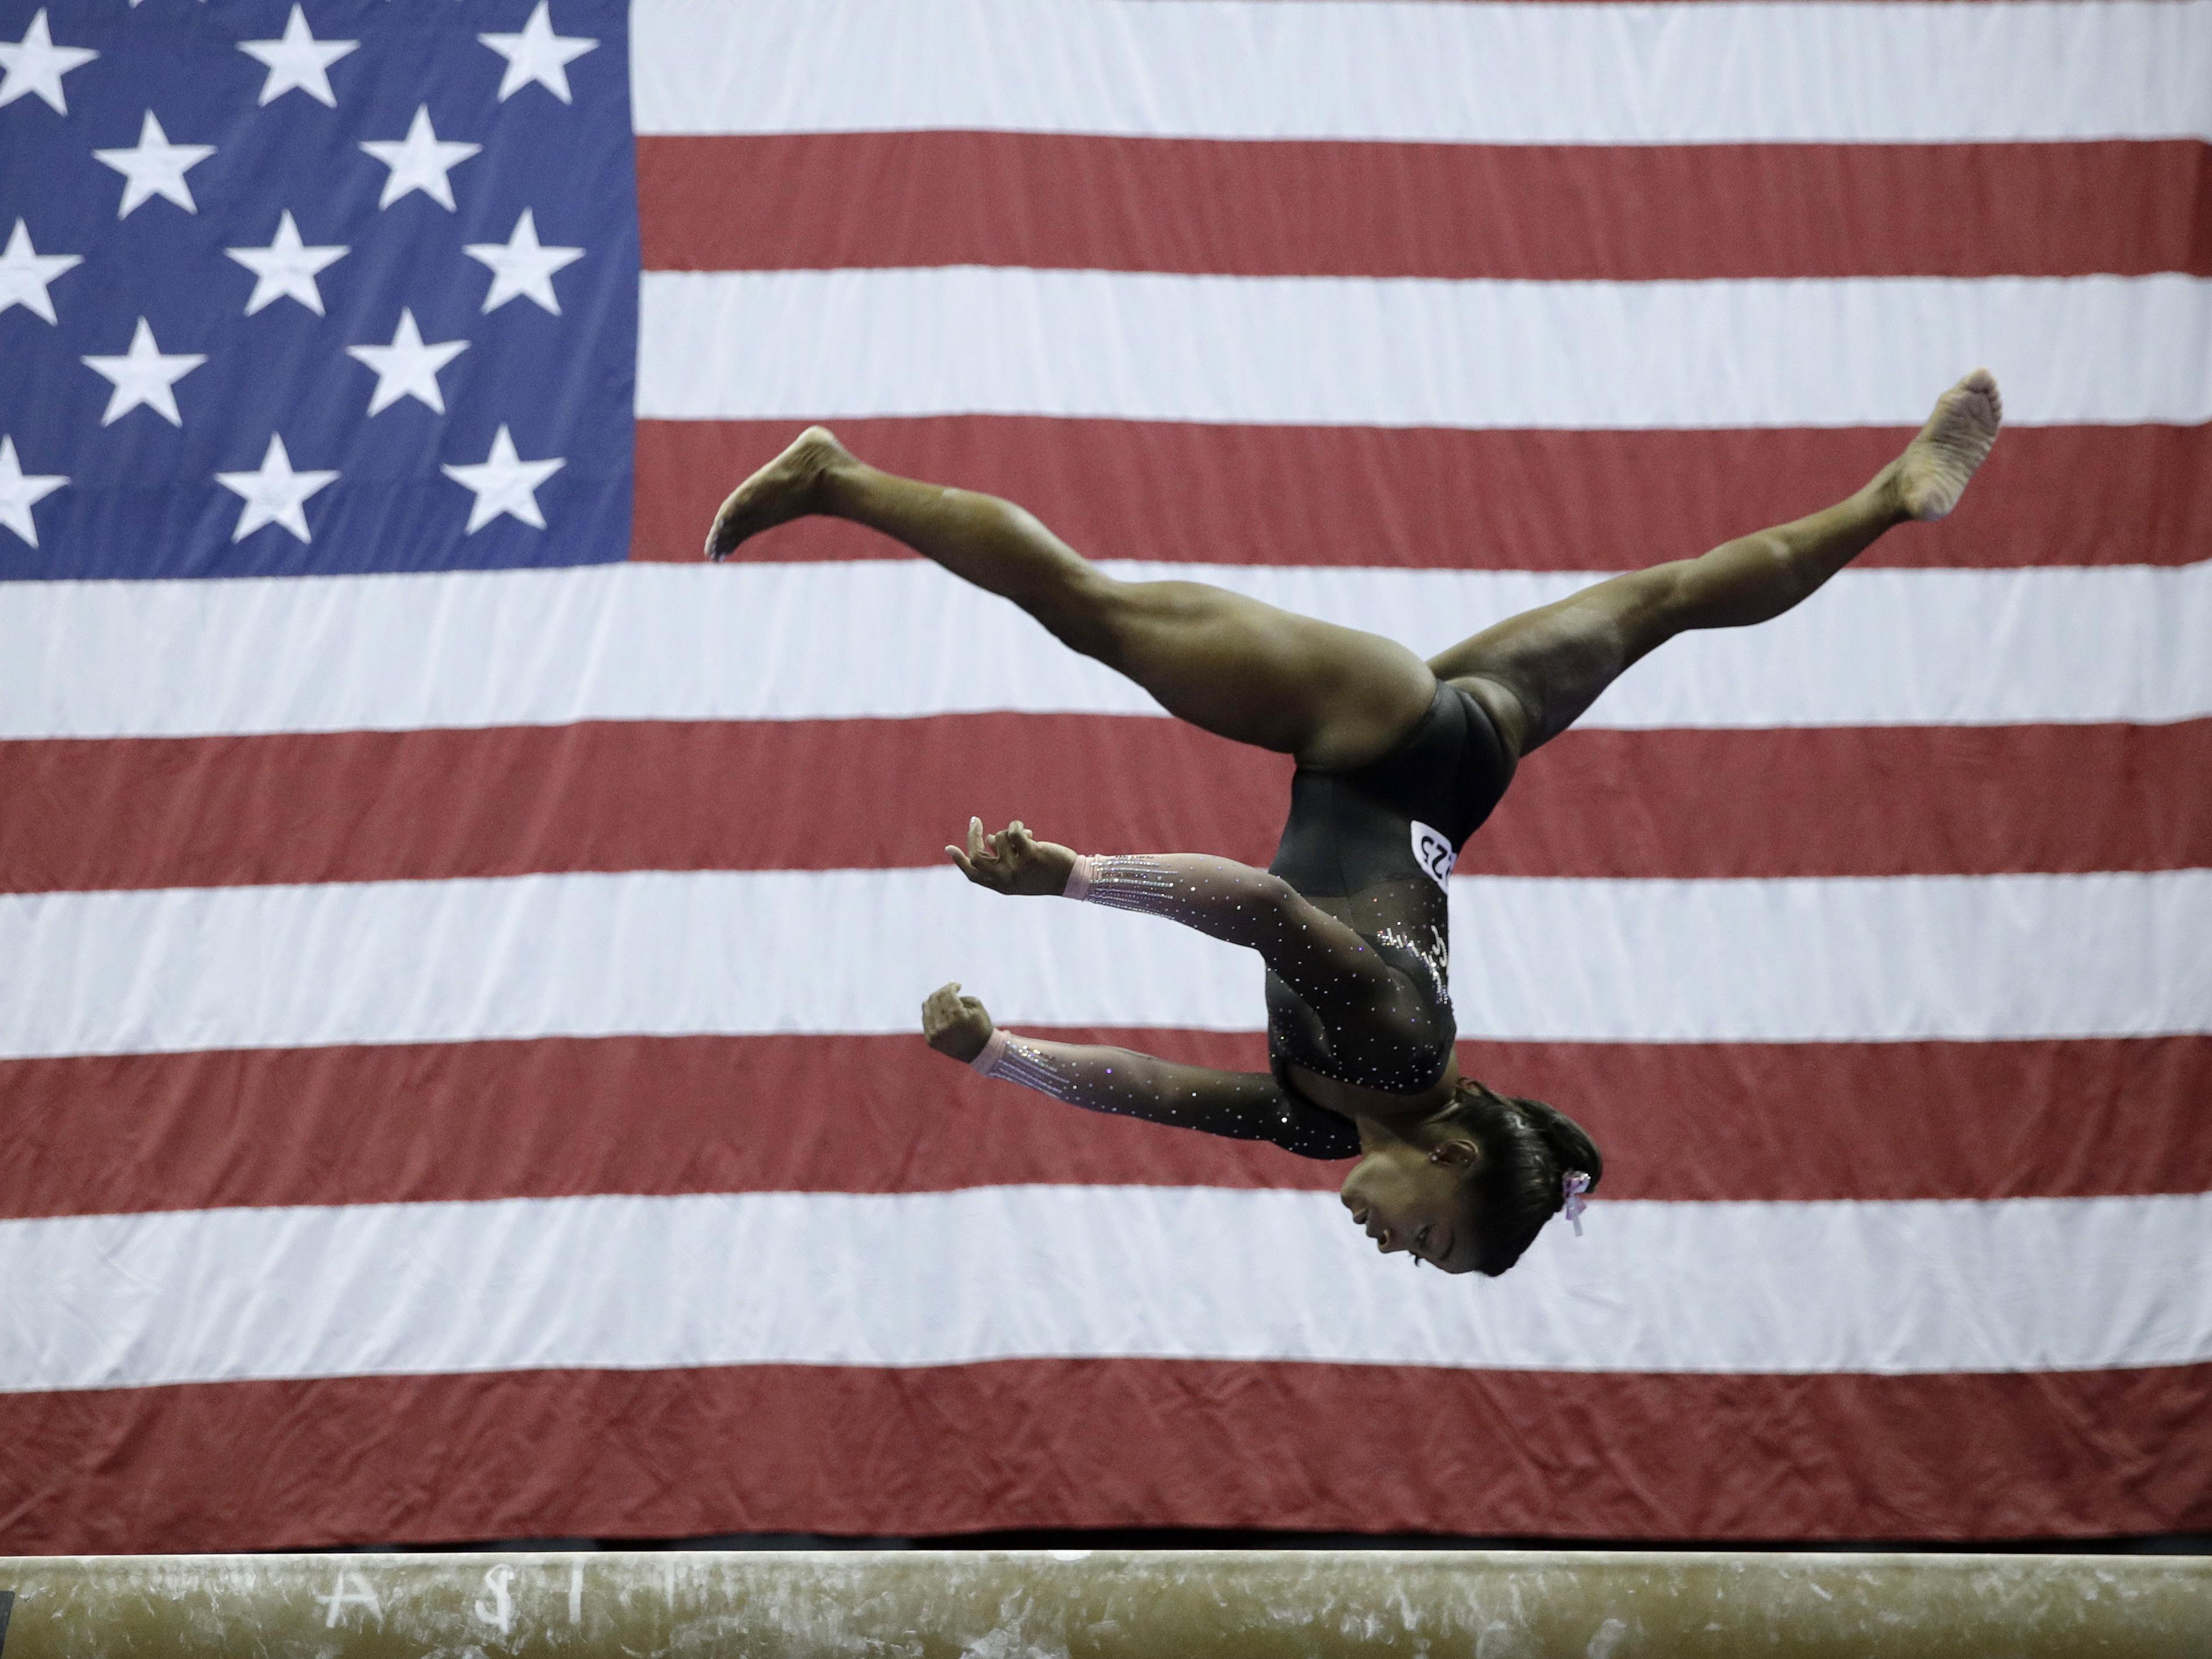 Simone Biles Earns 6th U.S. All-Around Gymnastics Title With Historic Triple-Double